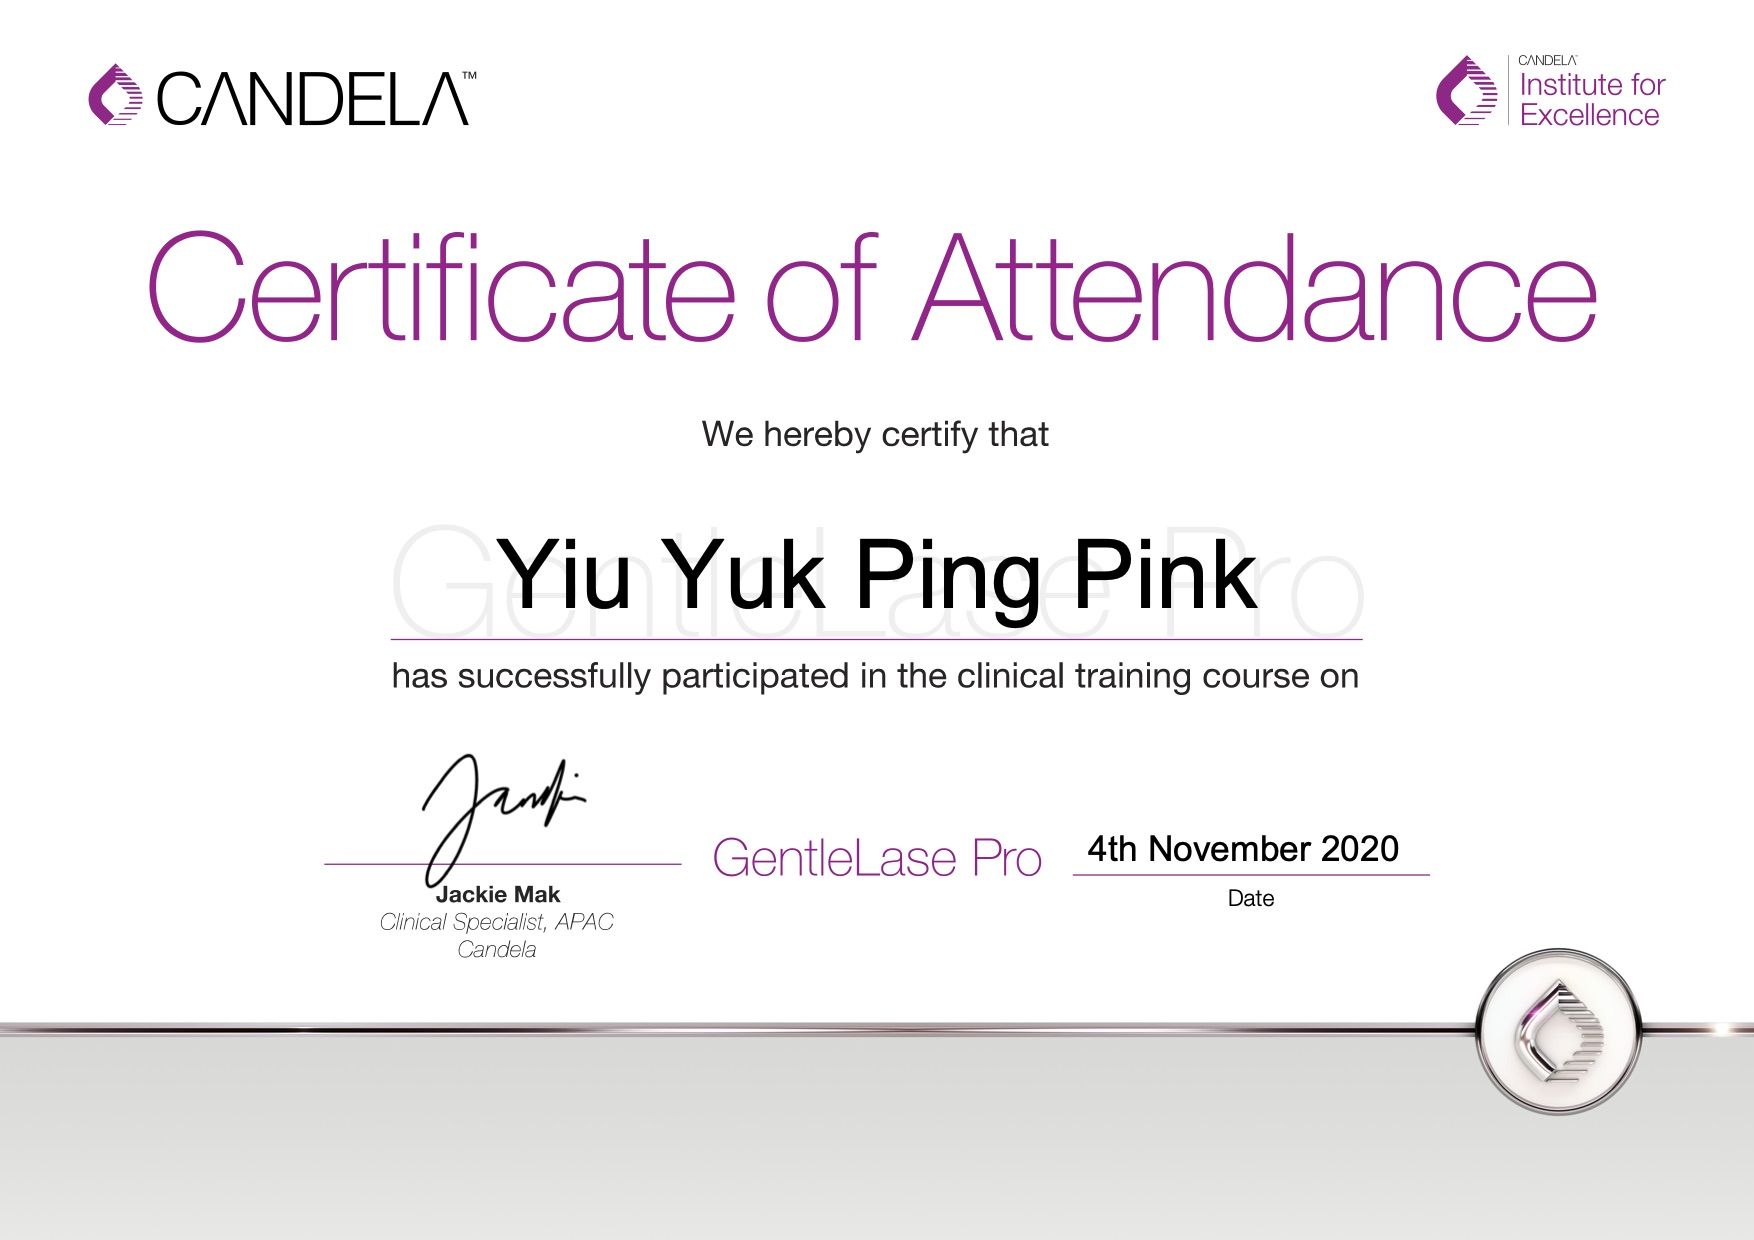 GentleLase_Pro_Certifcate_YiuYukPing(Yanis)